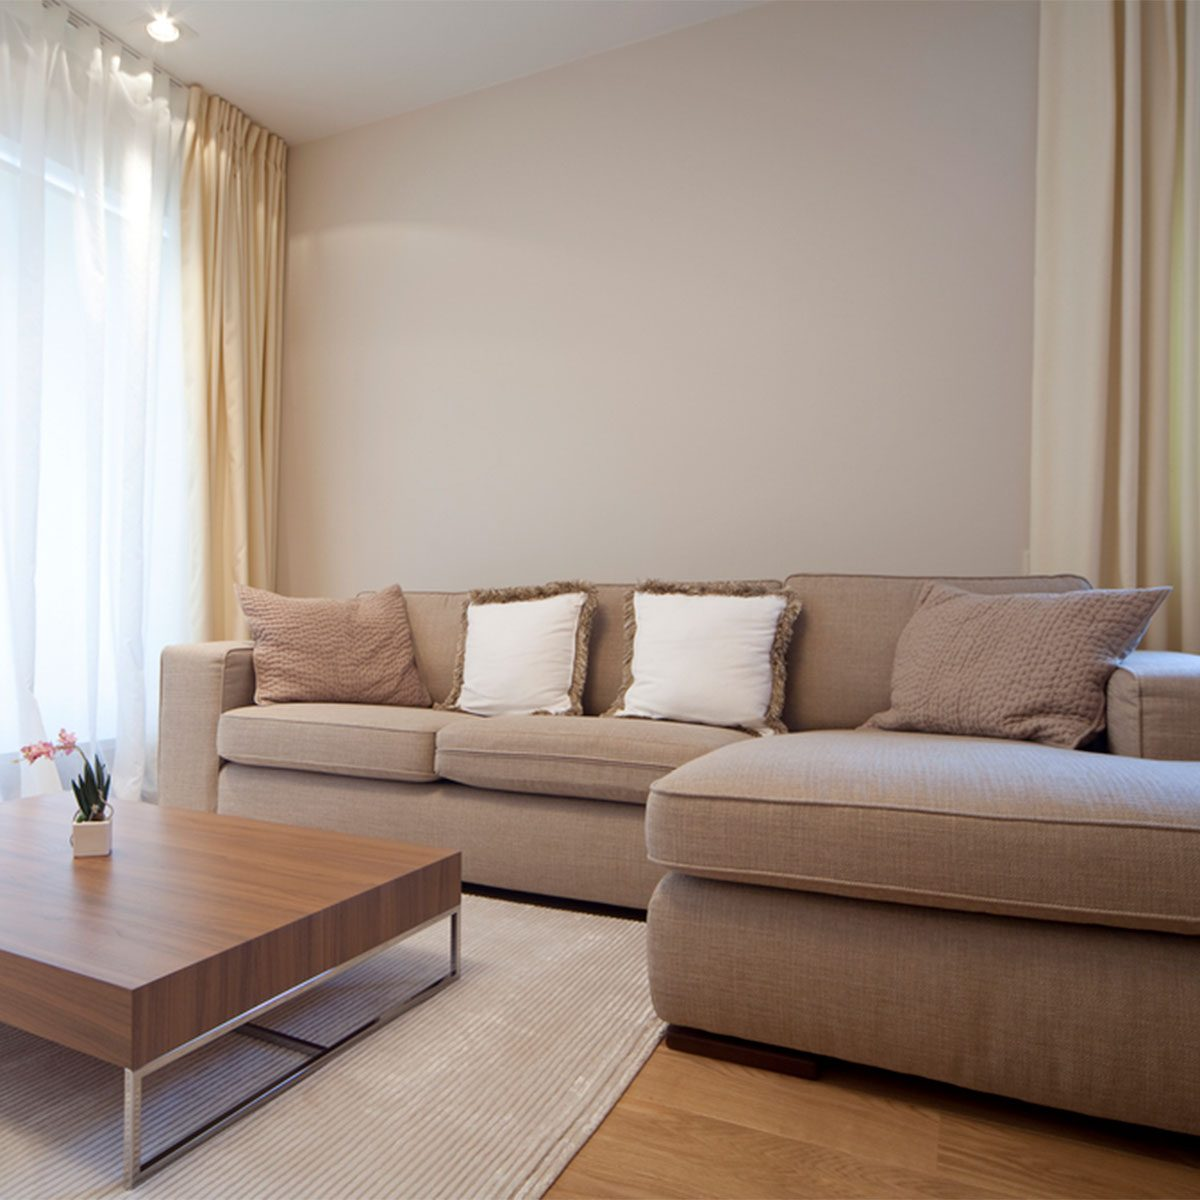 100 Cheap Decor Ideas That Look Expensive The Family Handyman